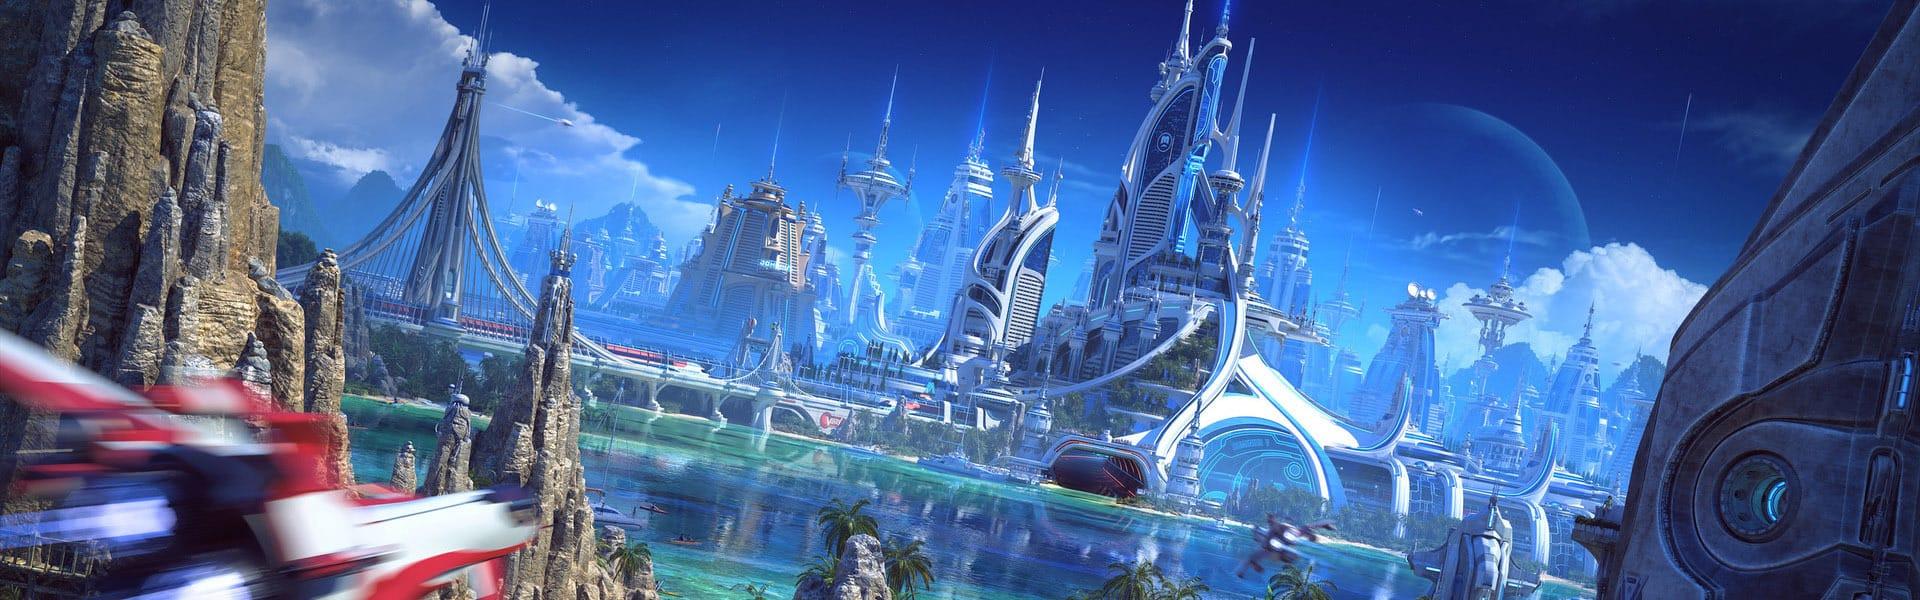 V-Ray for 3ds Max Toni Bratincevic Dominius Art Sci-Fi City